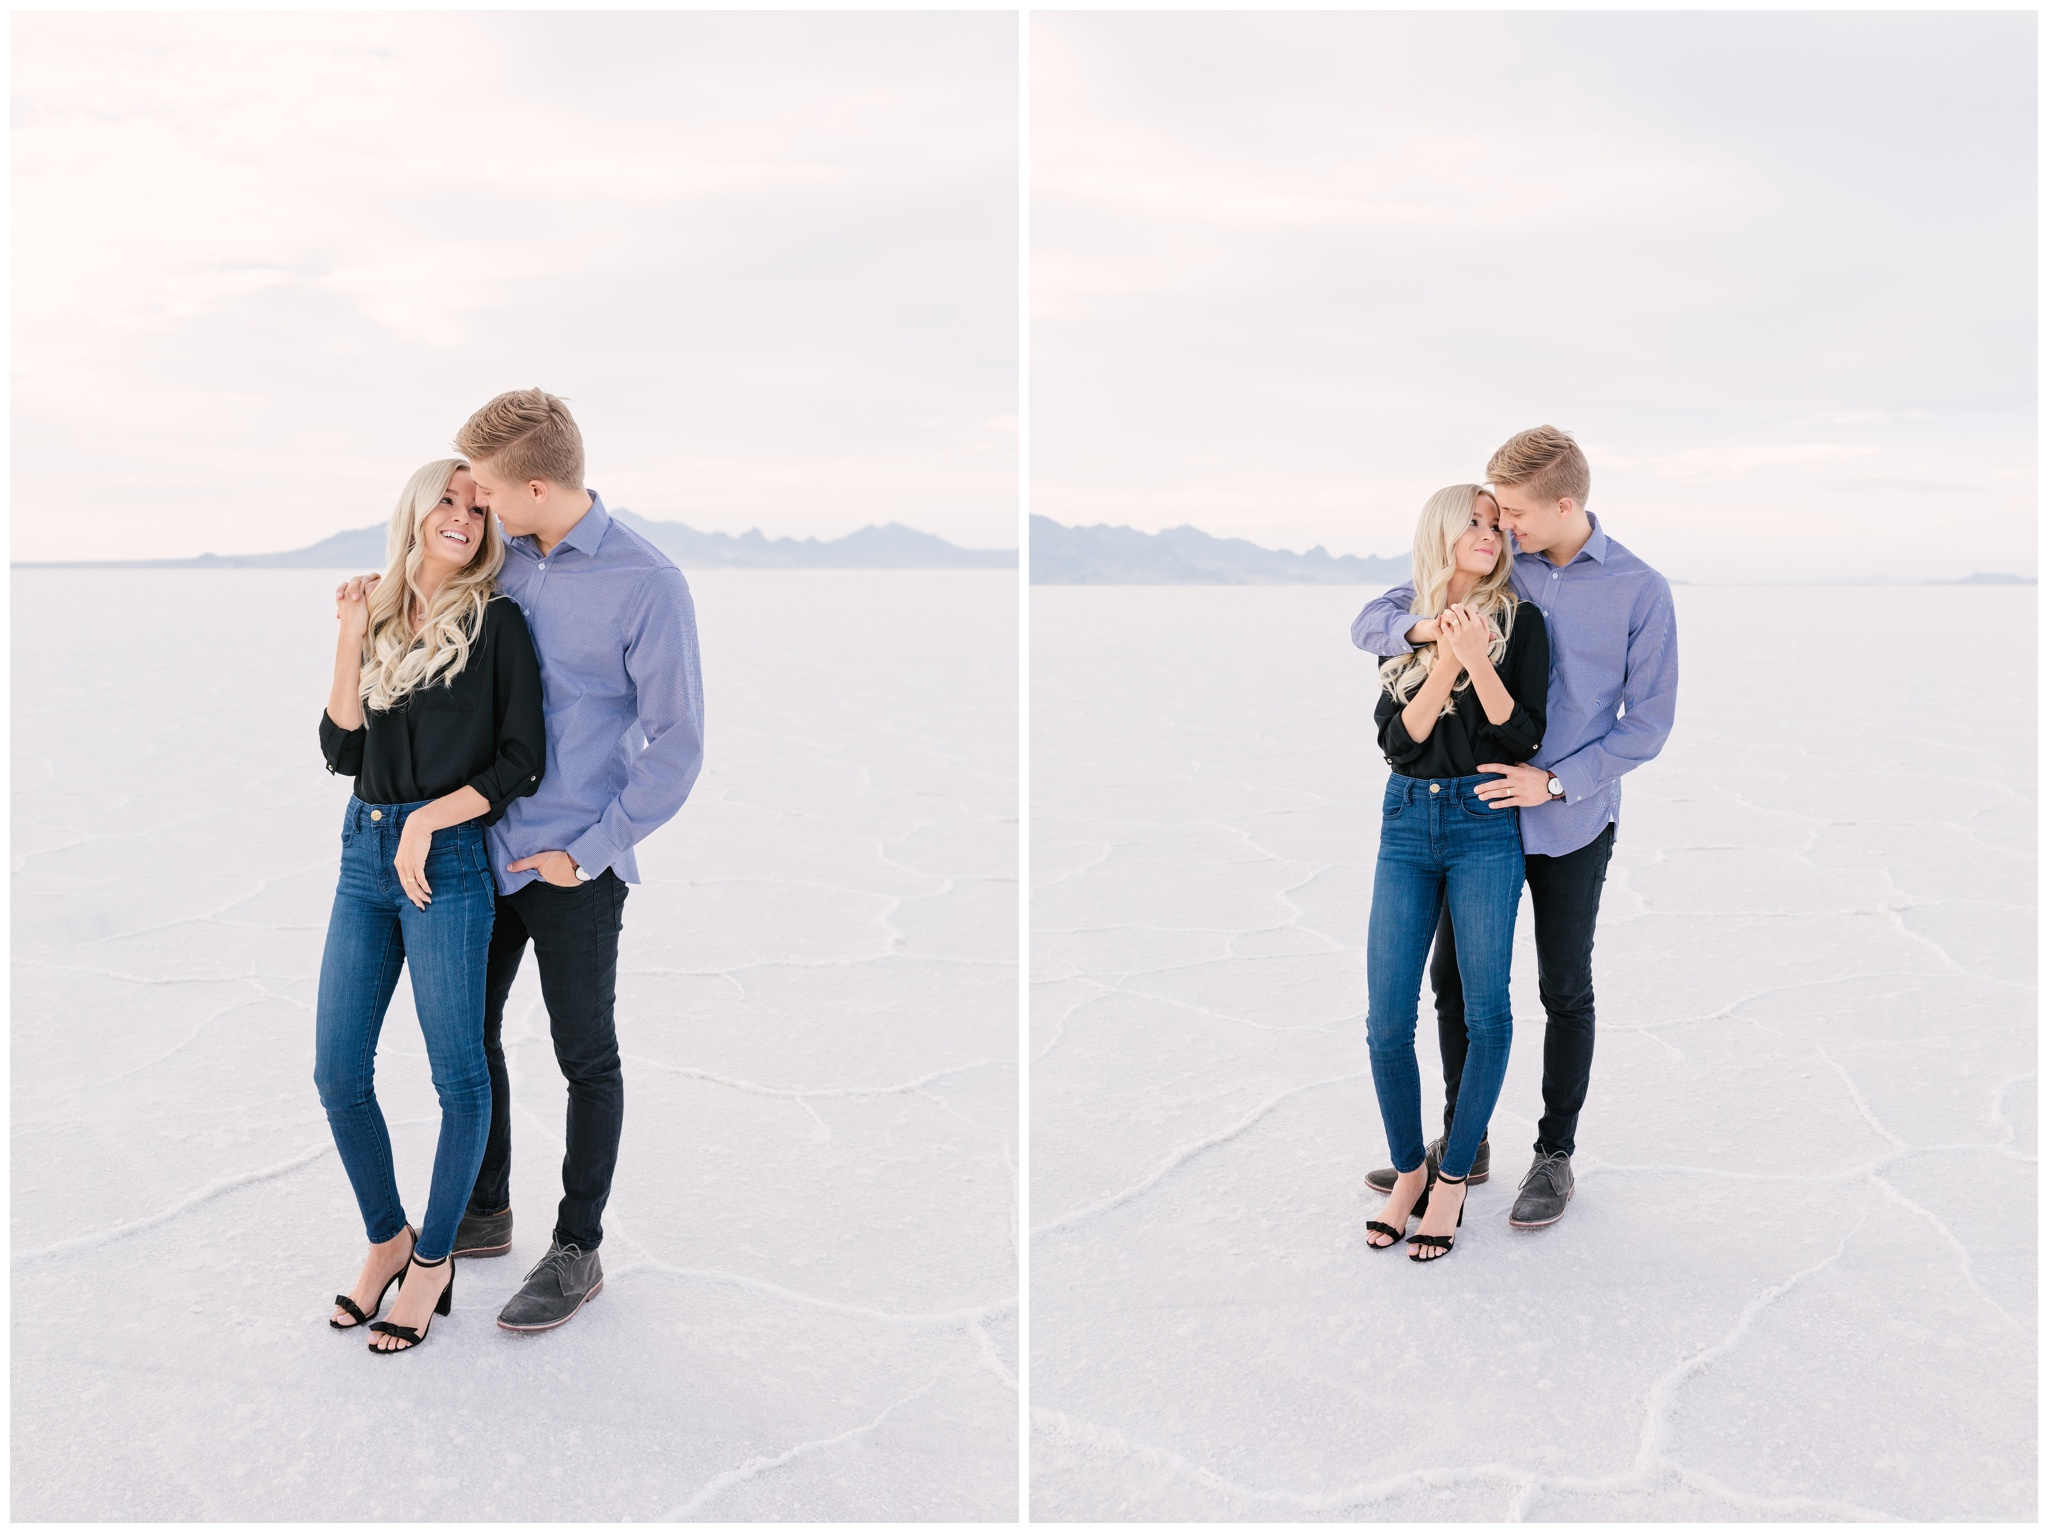 Cute couple posing at Bonneville Salt Flats